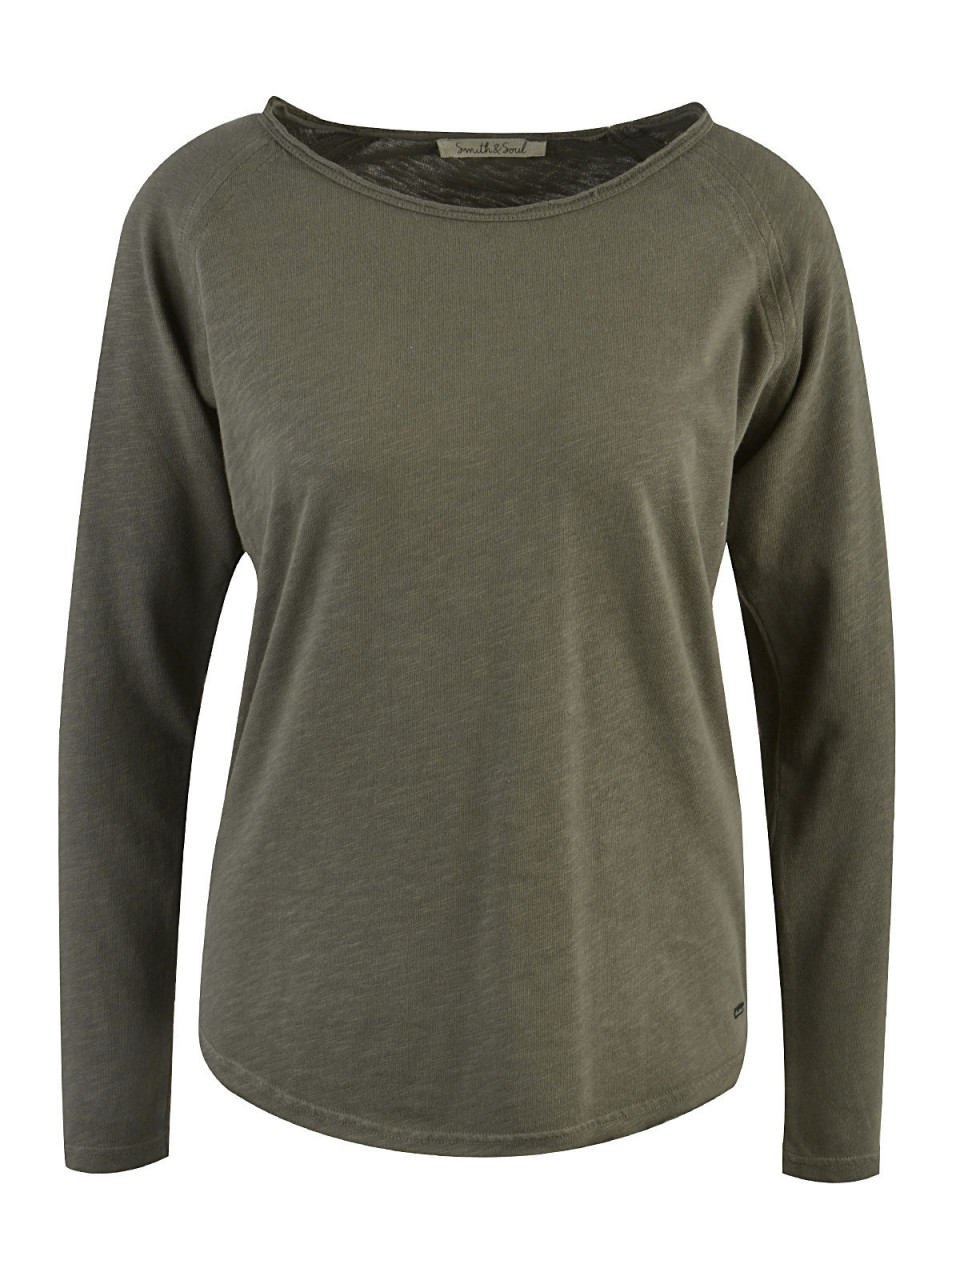 Oberteile - SMITH SOUL Damen Sweatshirt, oliv  - Onlineshop Designermode.com